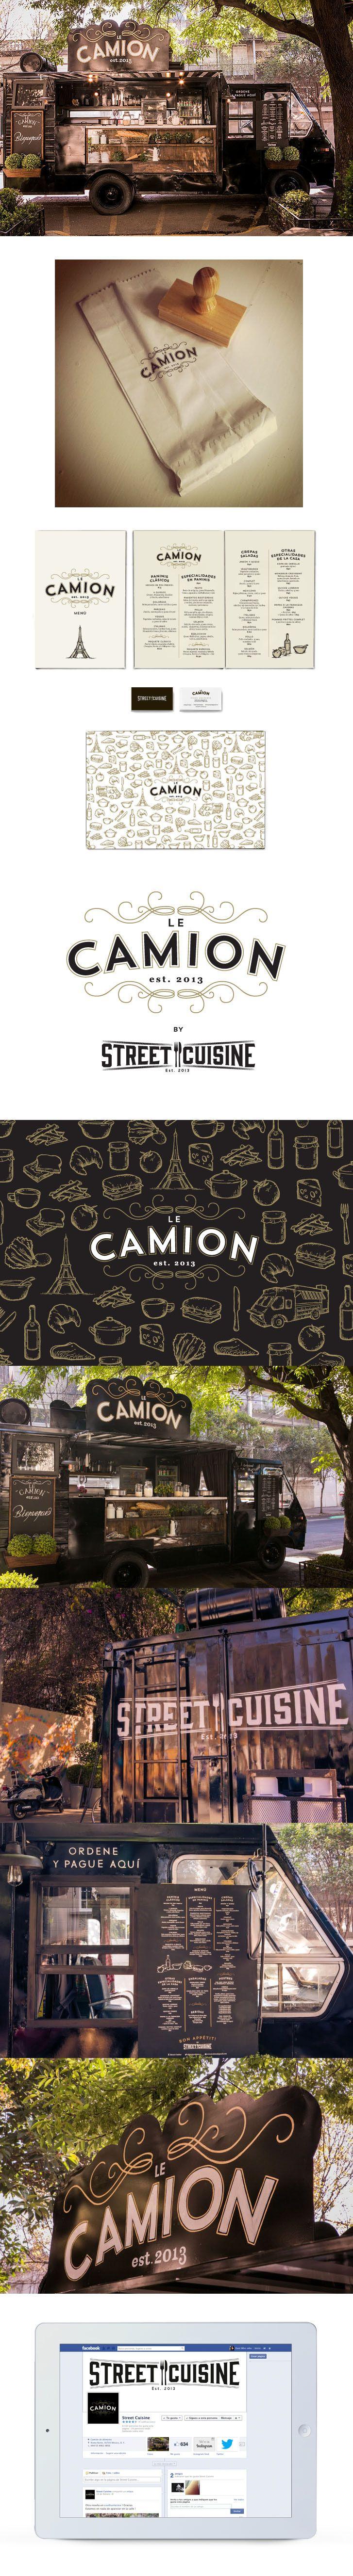 25 of the best food truck designs design galleries paste - Art Direction Logo Design Branding And Food Truck Exterior Design